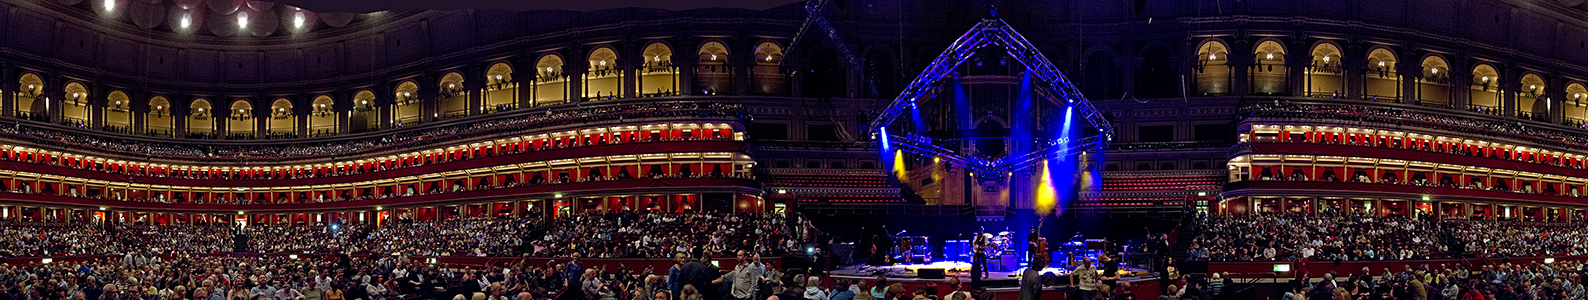 London Royal Albert Hall (vor dem Mark Knopfler-Konzert)